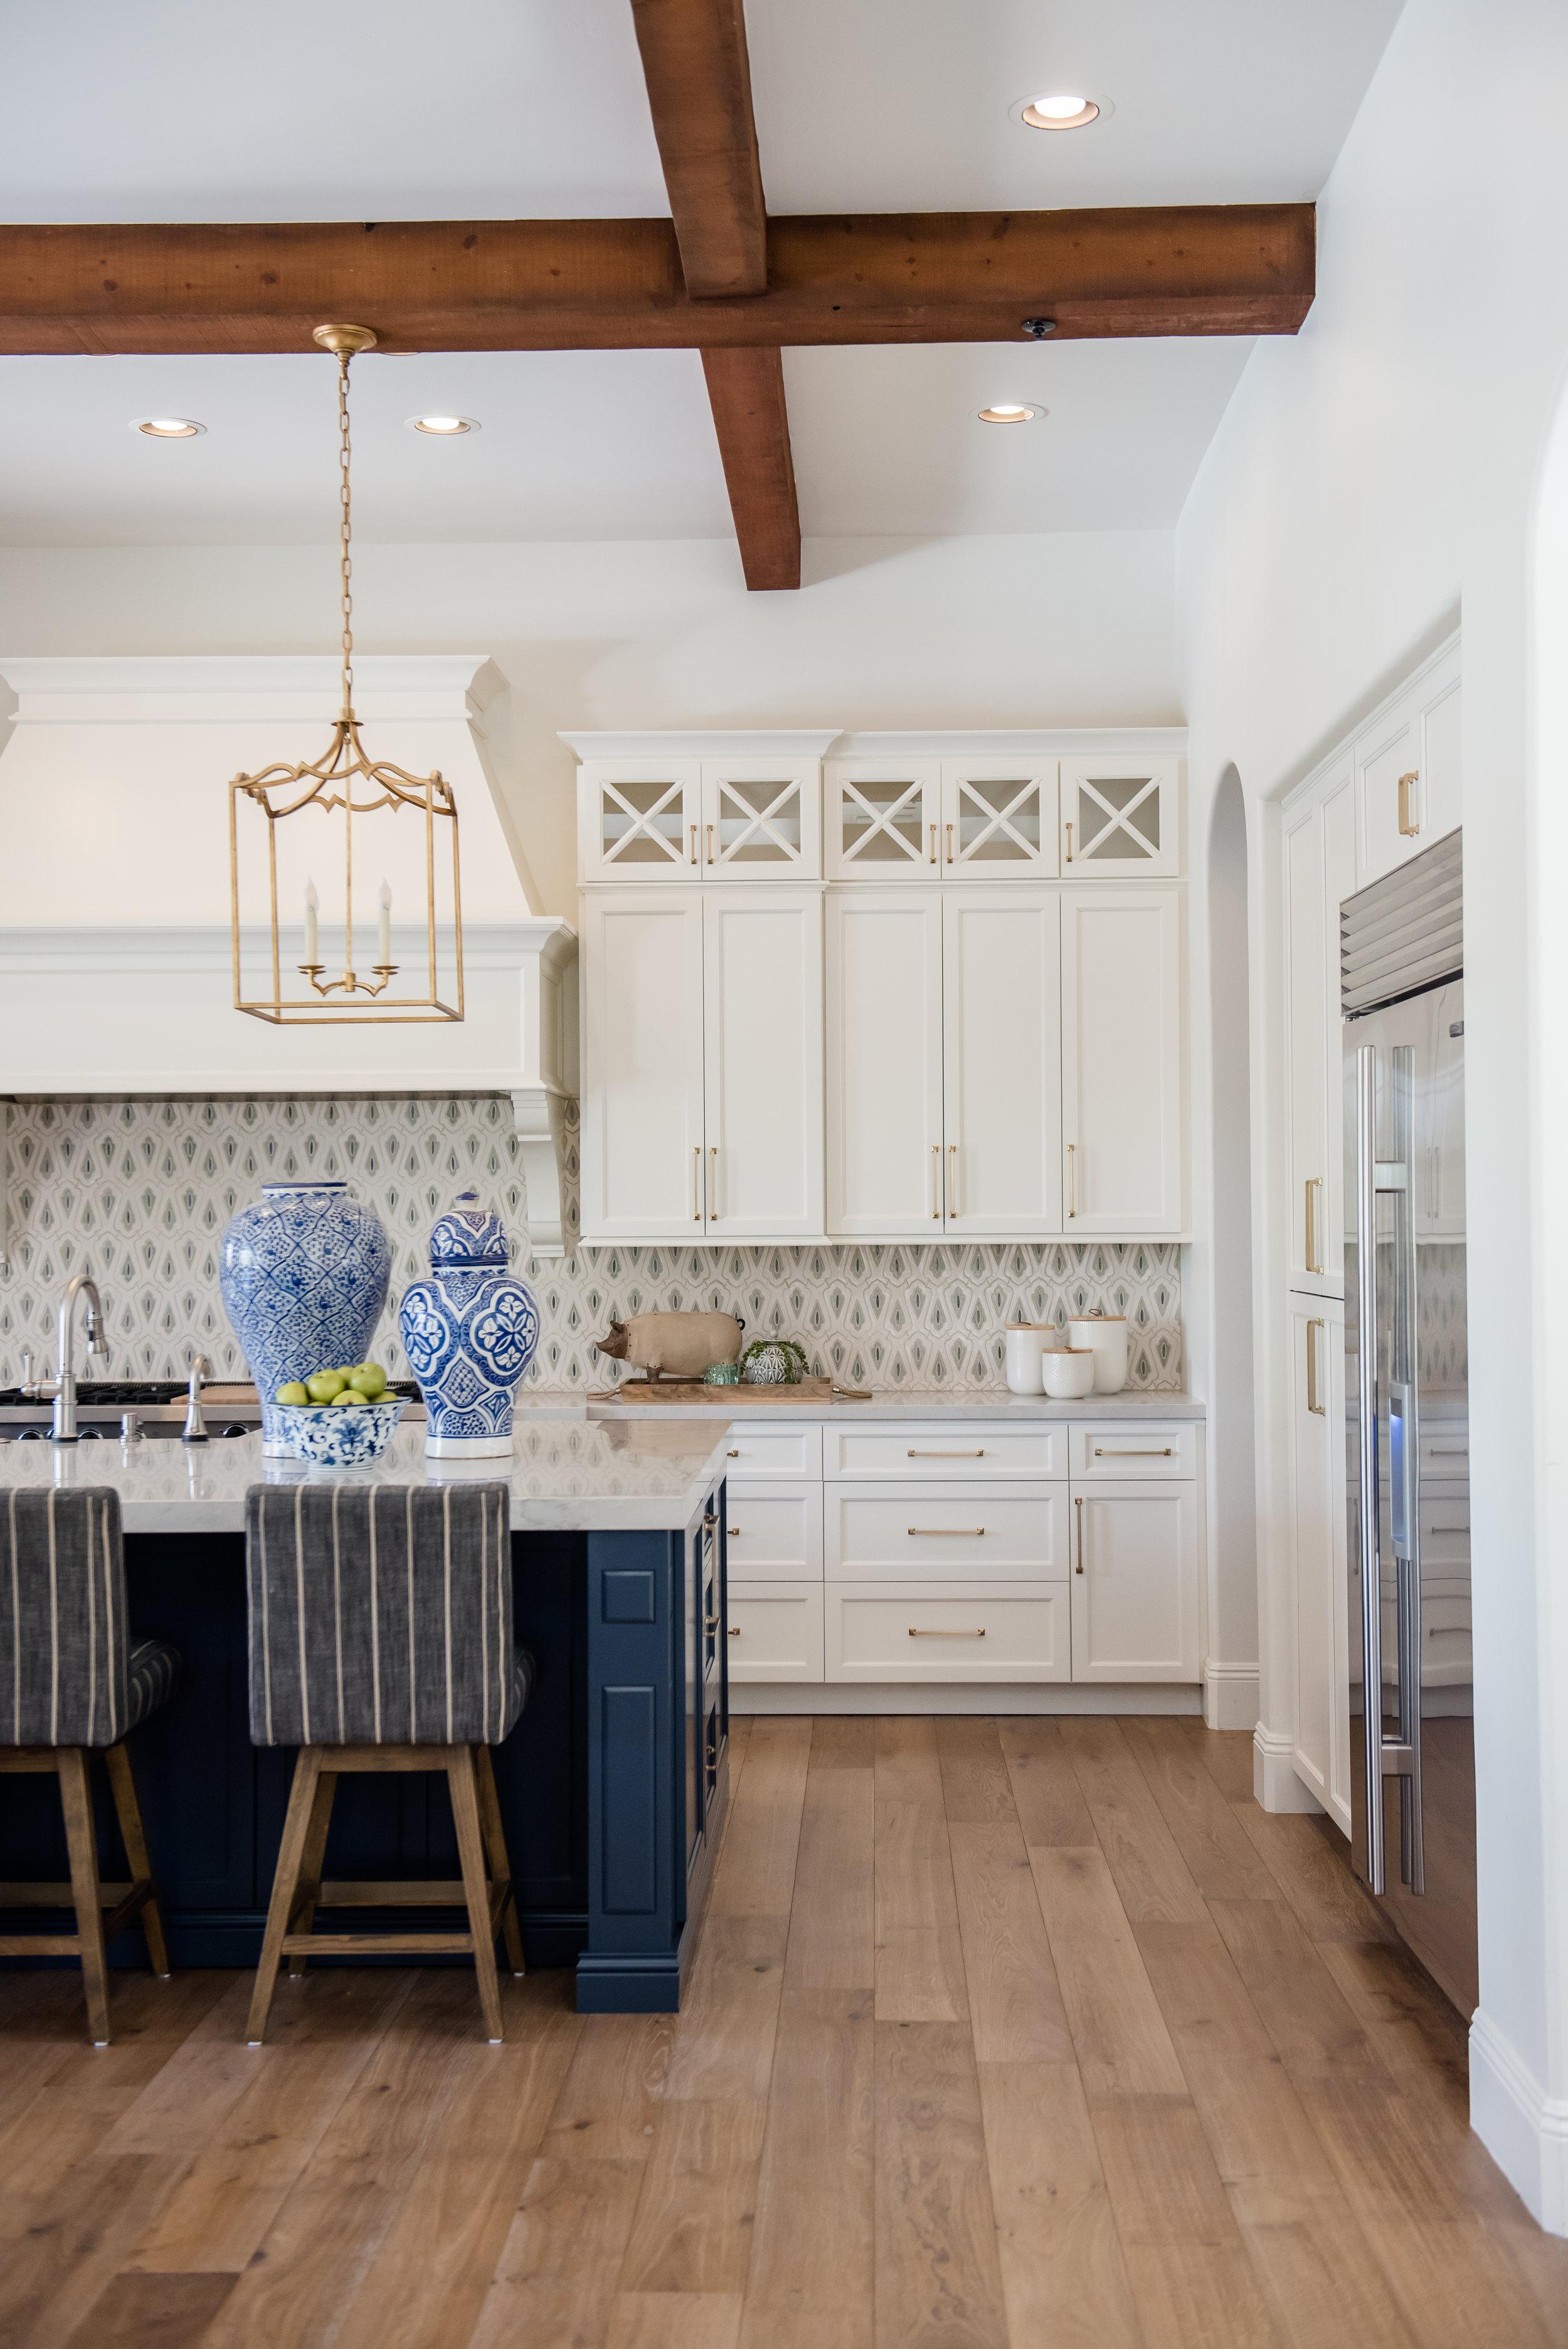 23a+kitchen+hood+pots+stripedstools+navyblueisland+backsplashtile+openshelves+pendants+brasslighting.jpg